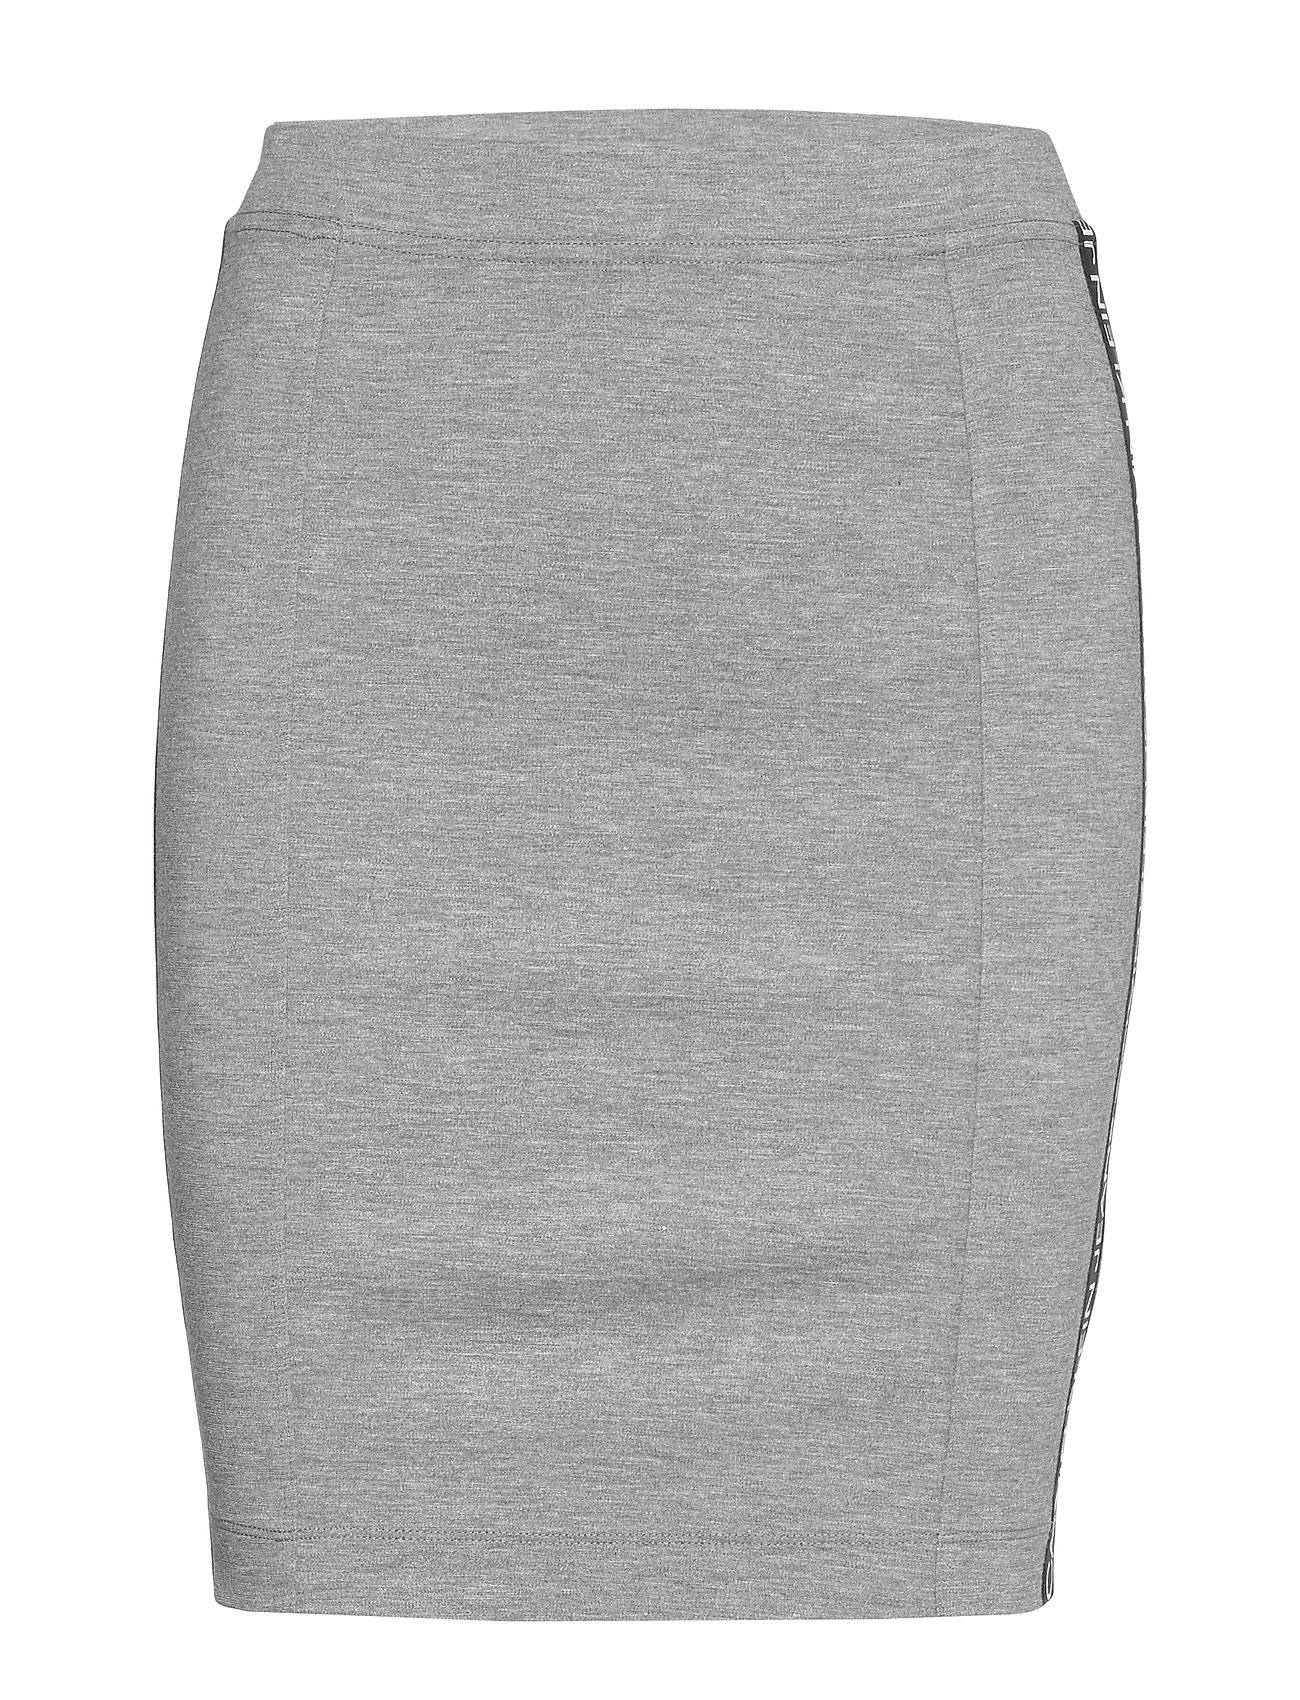 Image of Calvin Milano Logo Elastic Skirt Lyhyt Hame Harmaa Calvin Klein Jeans